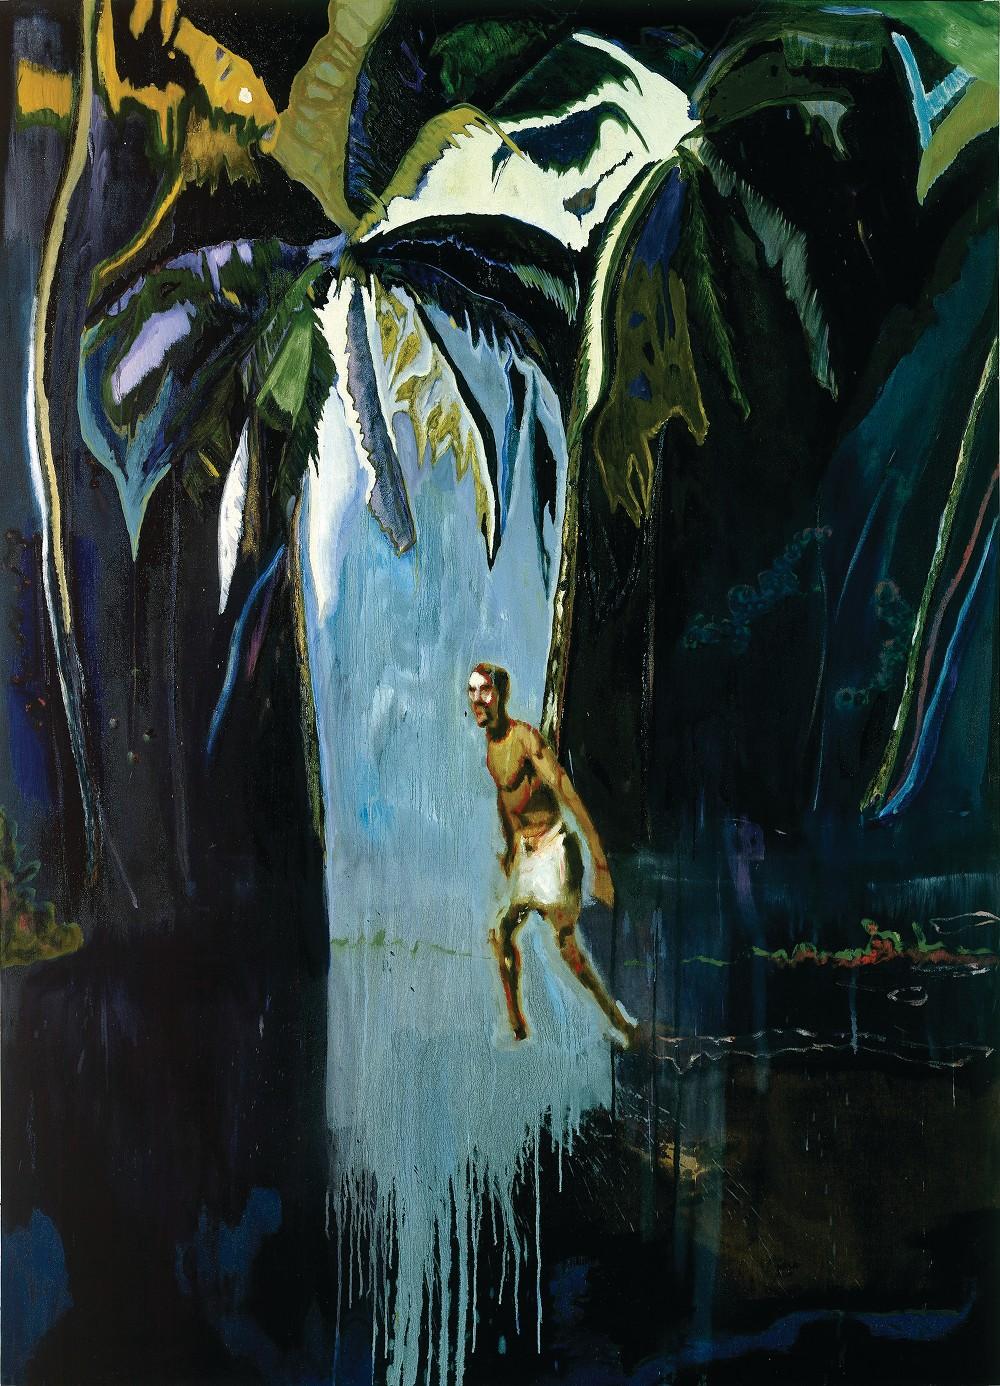 Pelican (Stag), huile sur toile (276 x 200.5 cm)